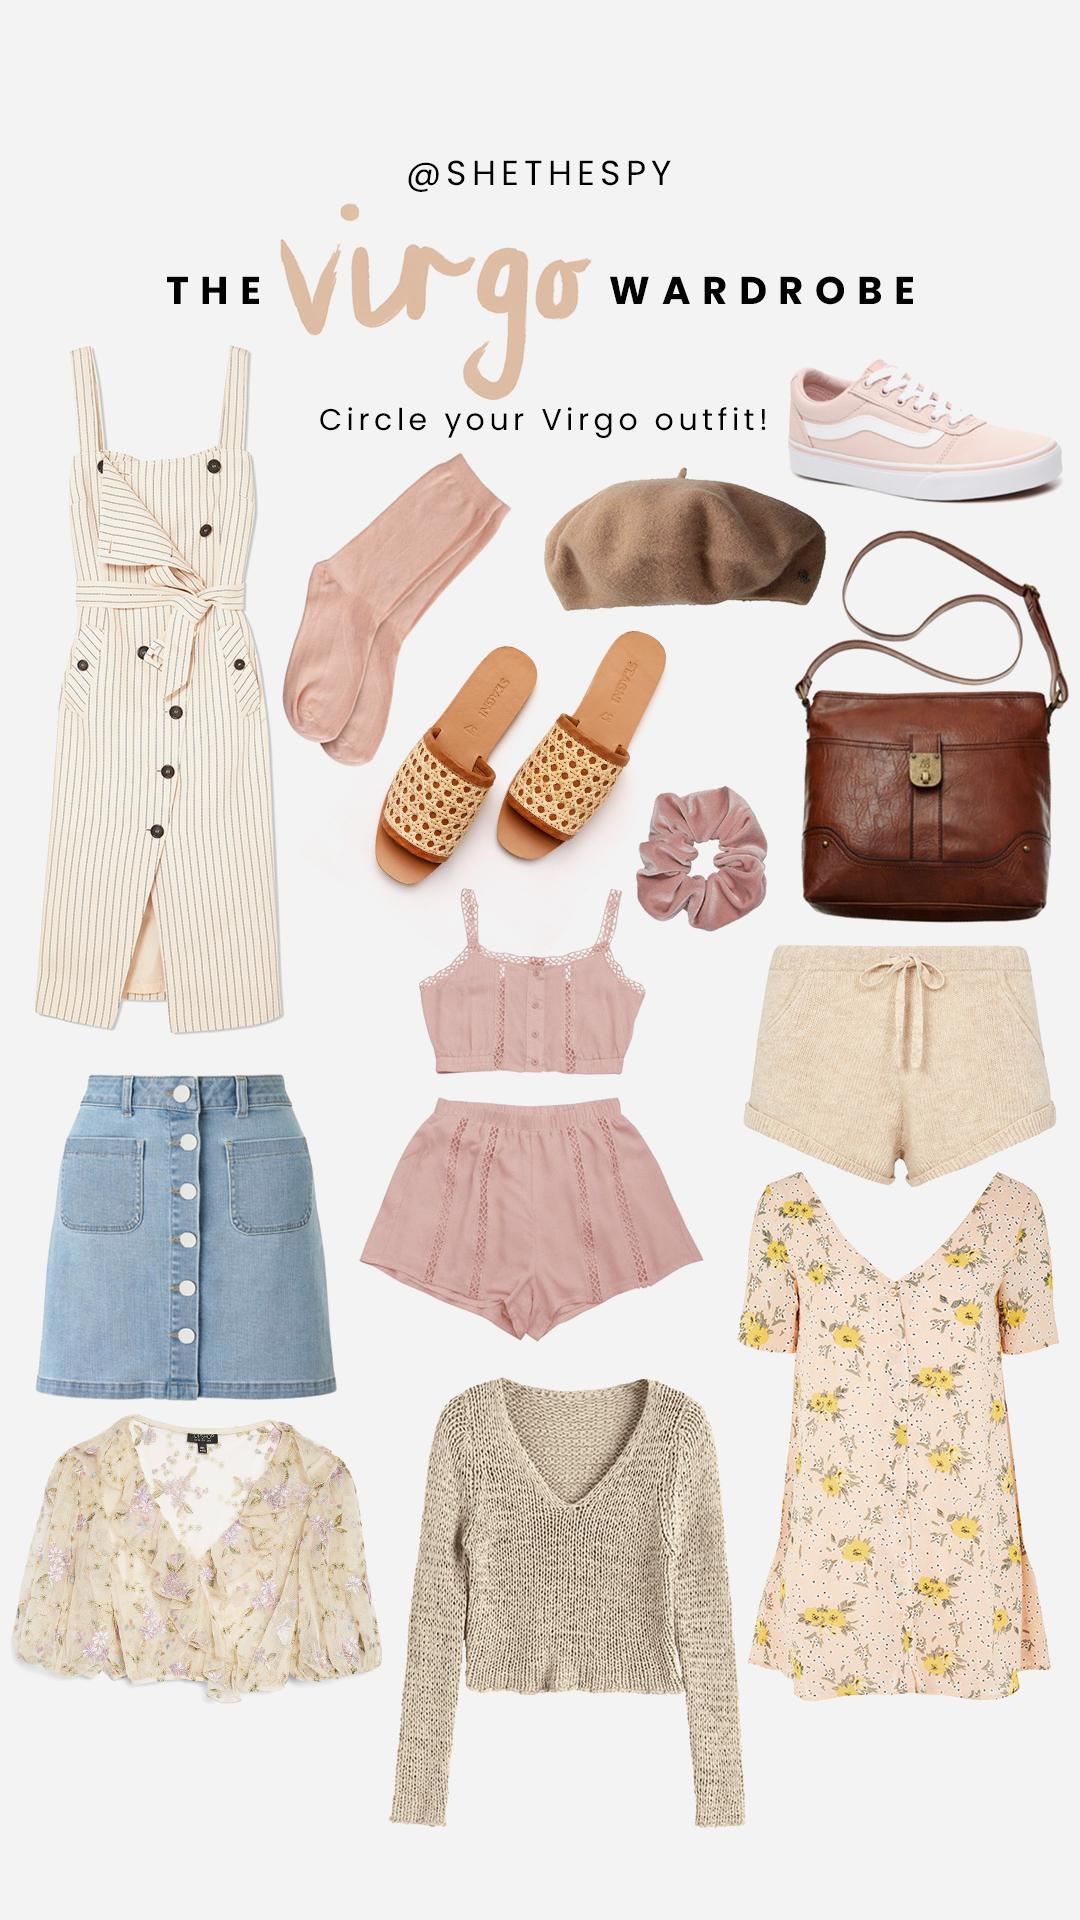 Shop Virgo - Stripe dress: AltuzarraSocks: UnknownBeret: Similar at Urban OutfittersSneakers: VansSlides: St AgniScrunchie: Urban OutfittersBag: UnknownShorts: SpellSet: ZafulSkirt: Similar at AsosFloral dress: Glamorous - Sold OutKnit: Zaful - Sold OutTop: Topshop